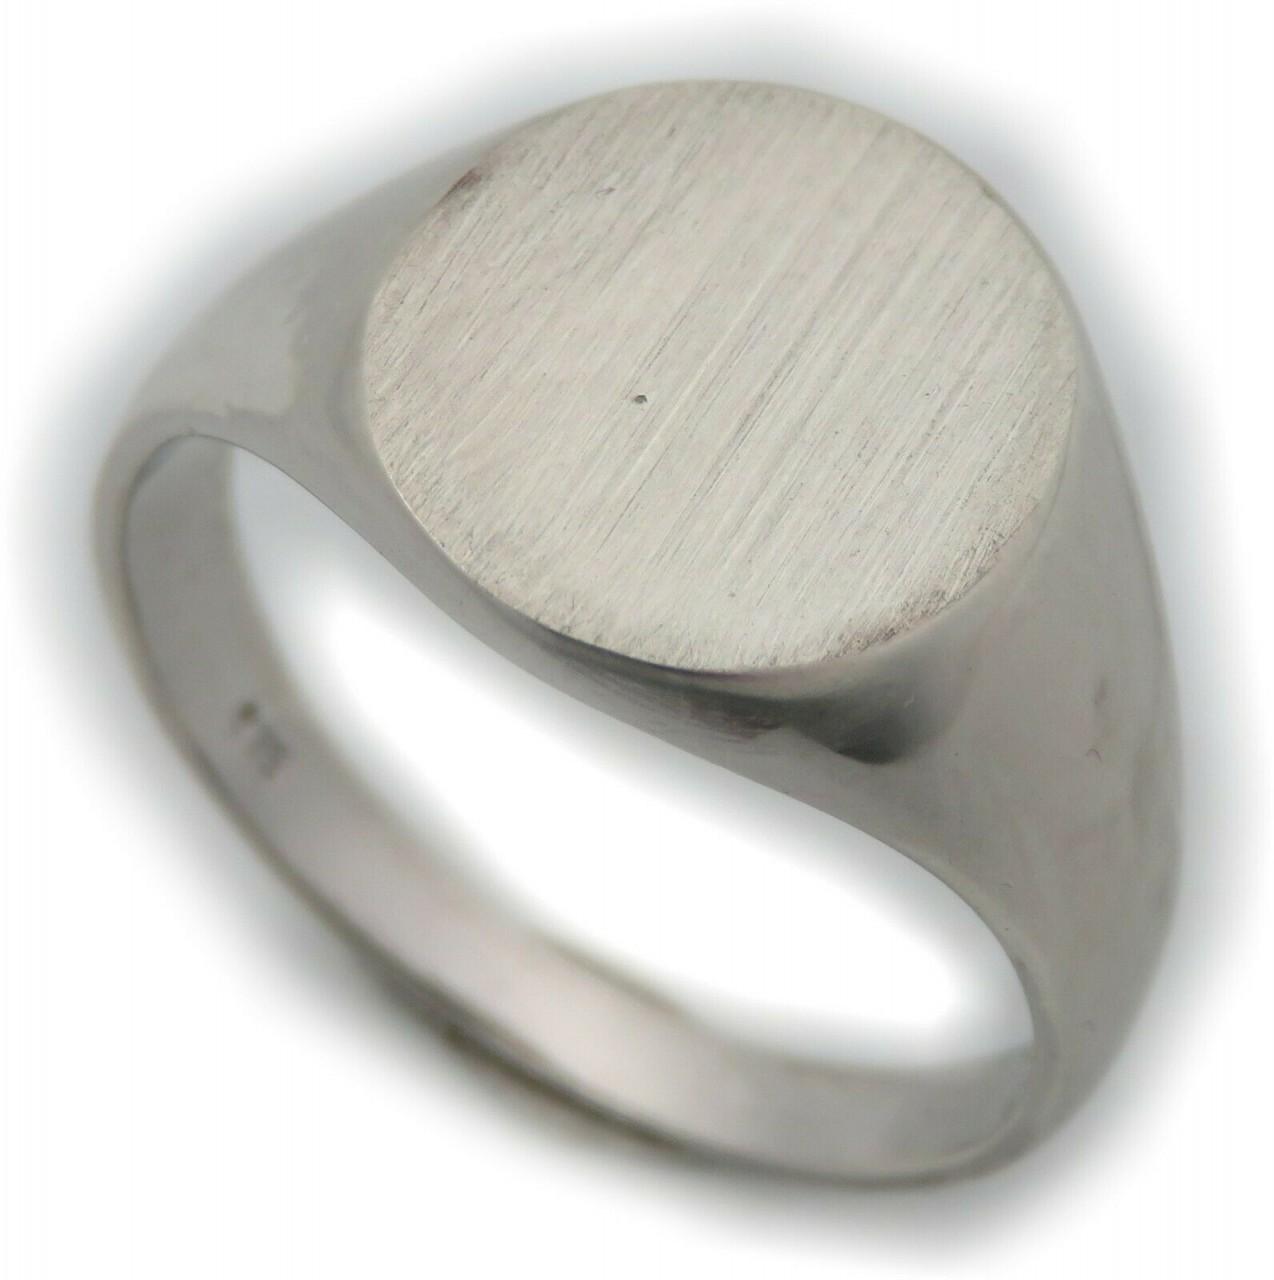 Neu Herren Ring Silber 925 mit Monogrammgravur Sterlingsilber Oval Siegelring